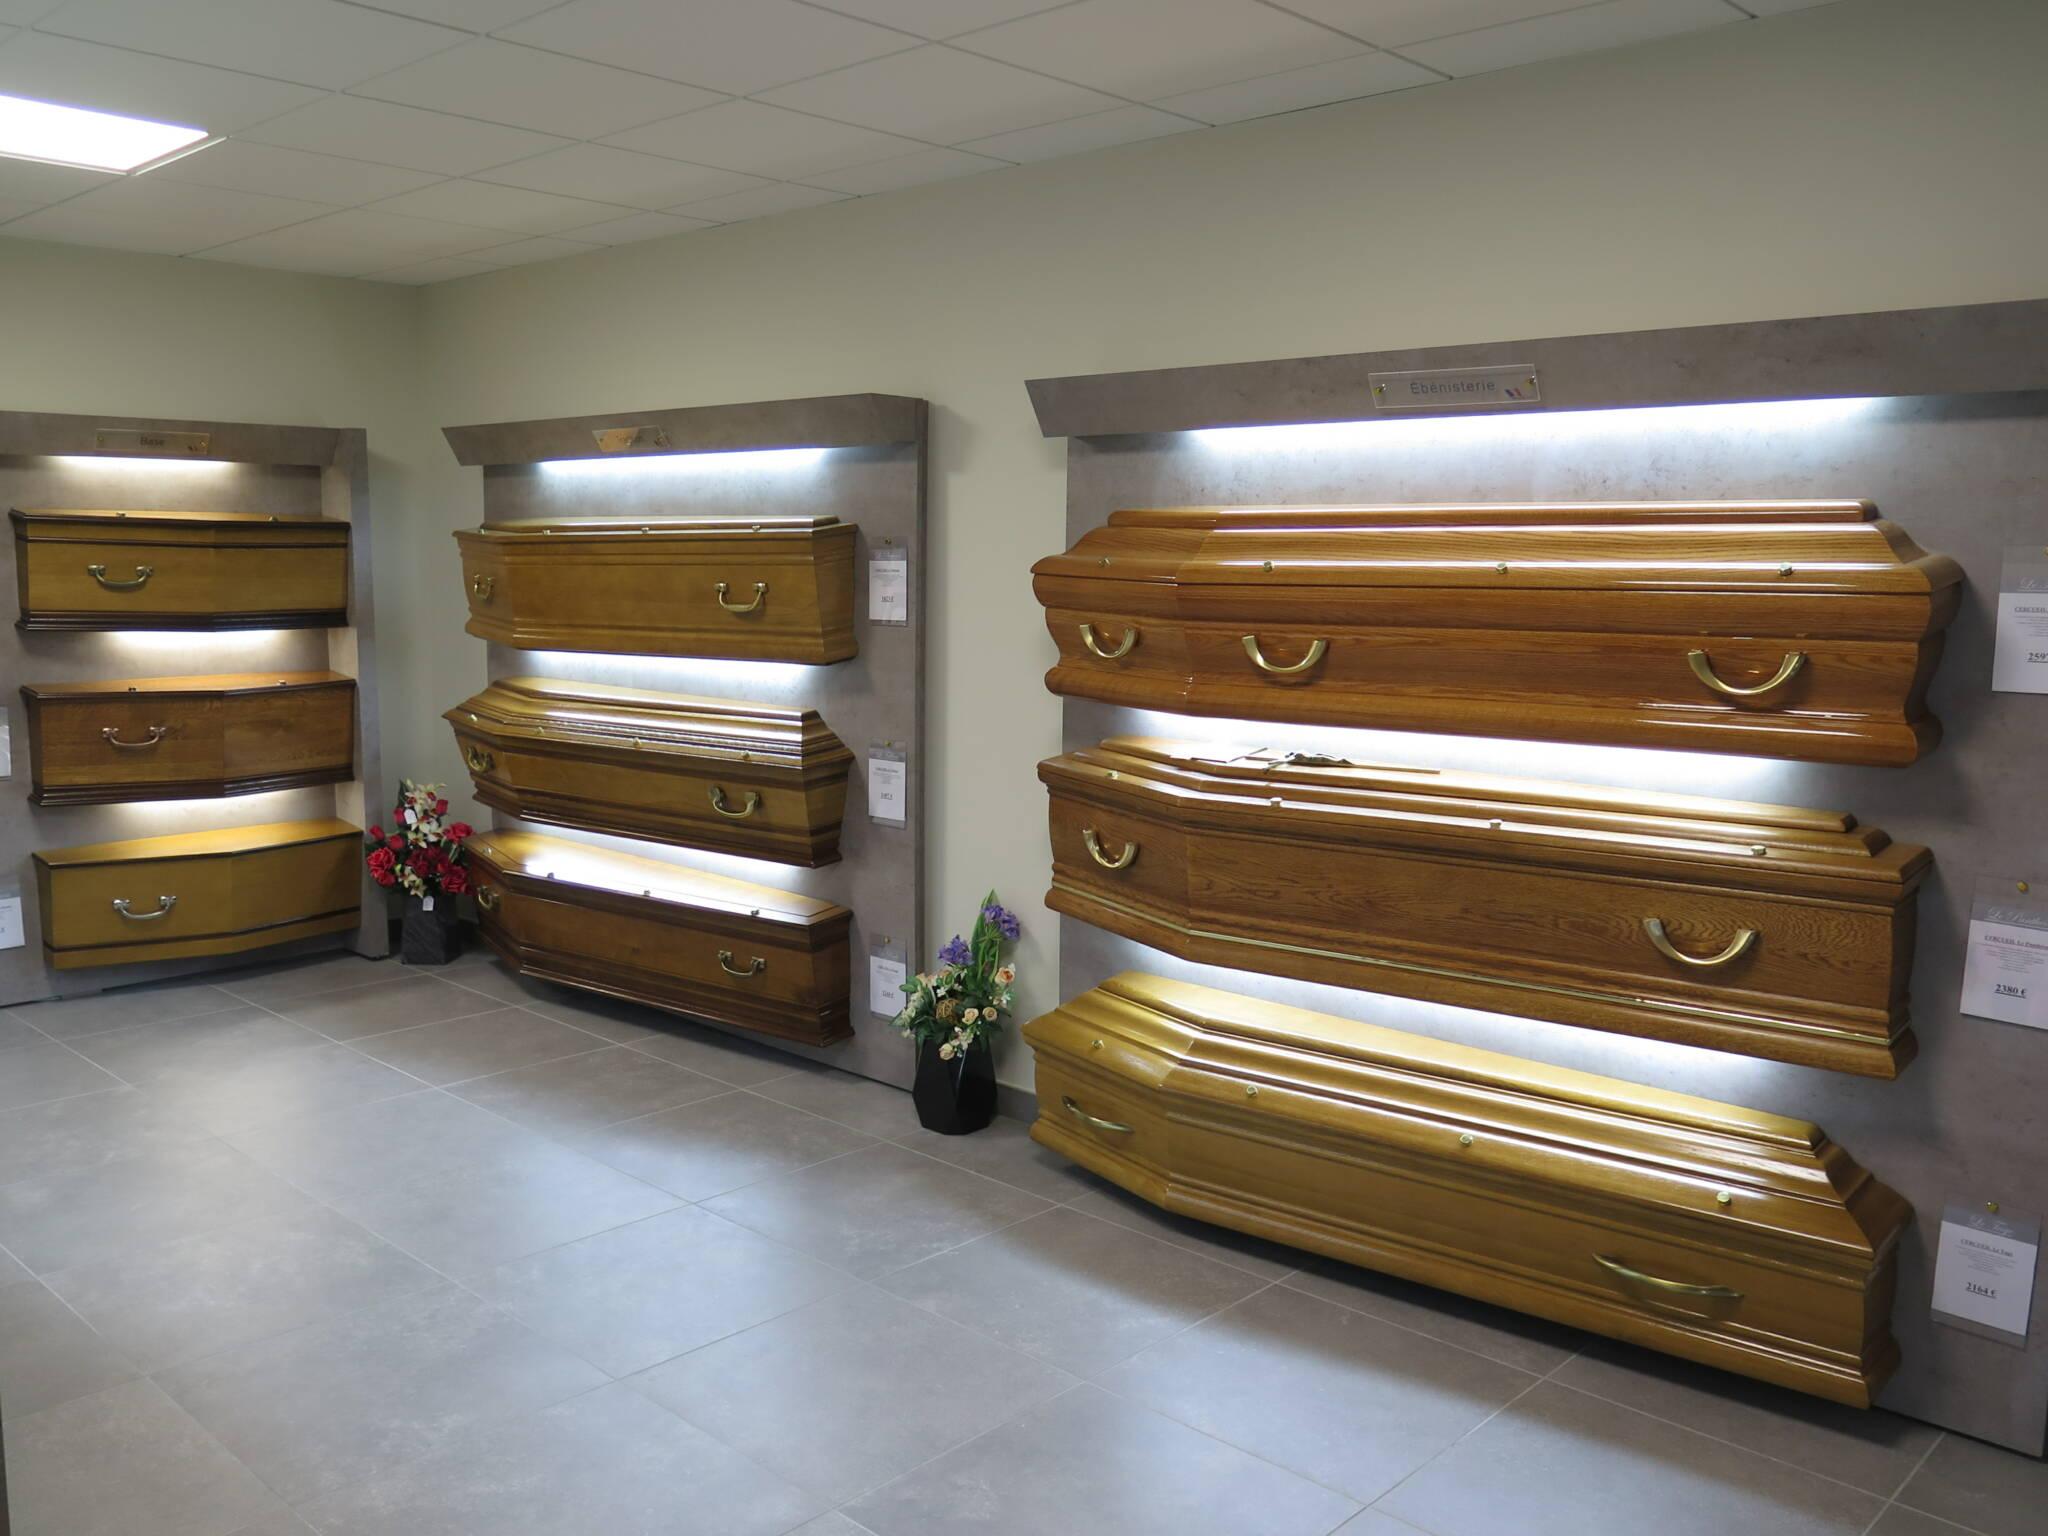 cercueil-inhumation-pompes funèbres pech